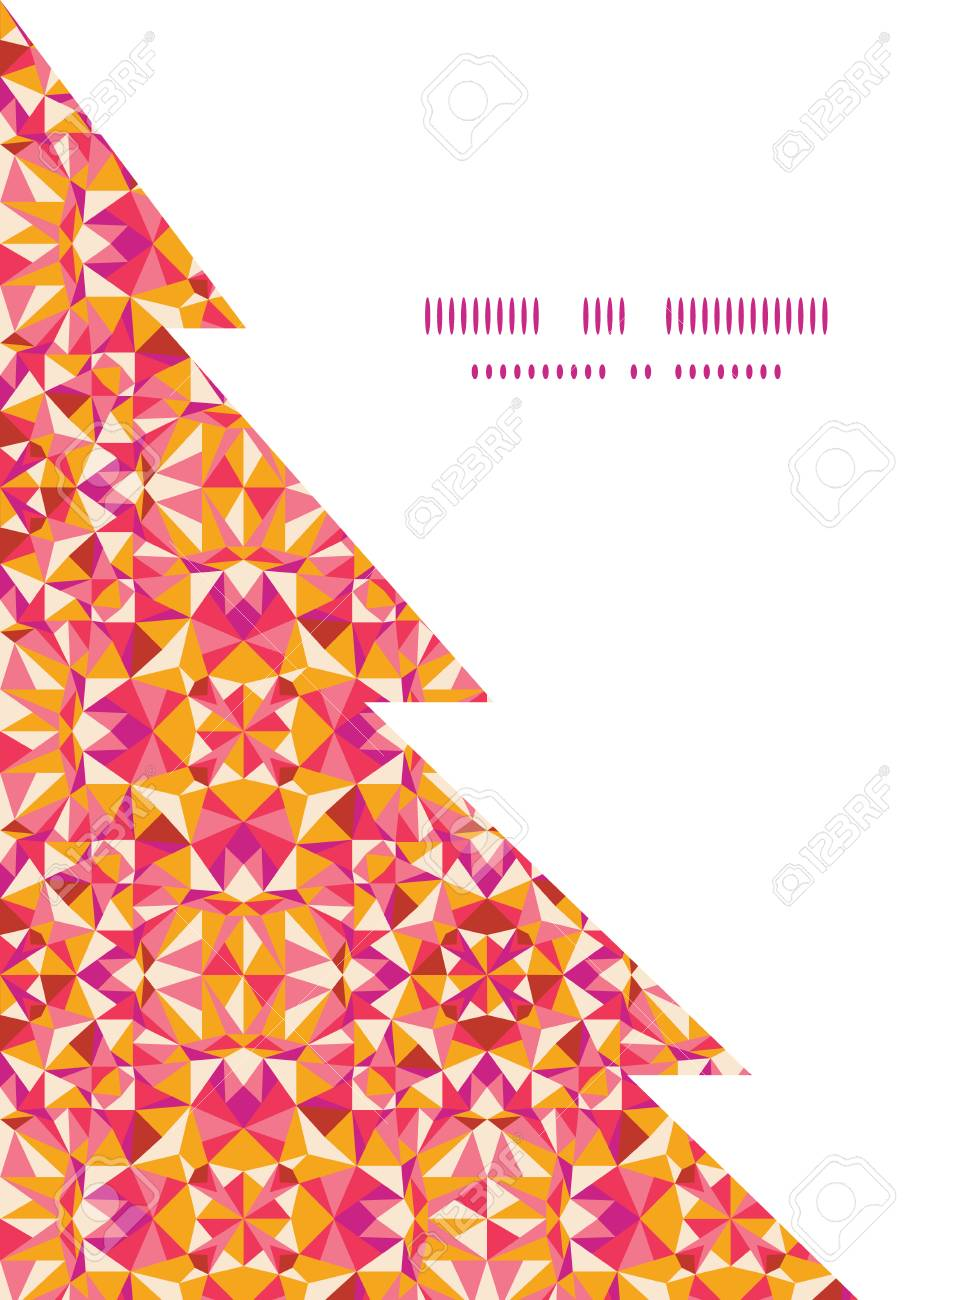 Colorido Textura Triángulo Plantilla árbol Silueta Tarjeta Marco ...